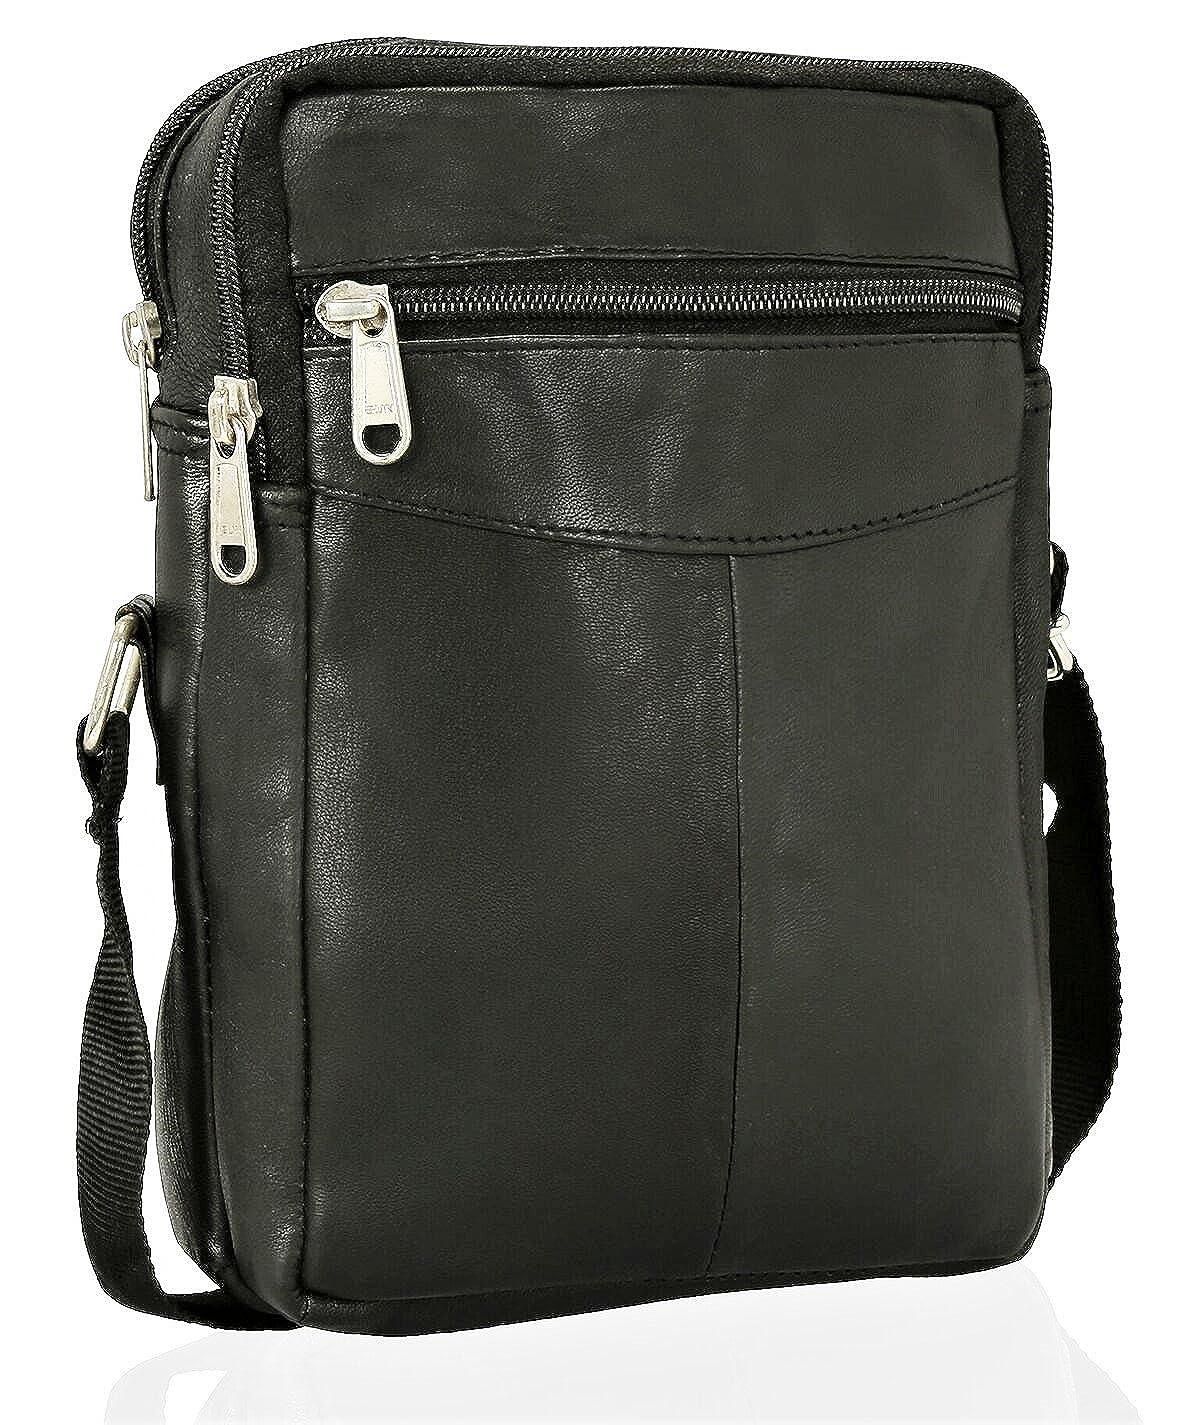 Real Leather Man Bag Mens/Ladies Unisex Shoulder Bag Cross Body Messenger Bag Travel Holiday Mobile Phone Organizer